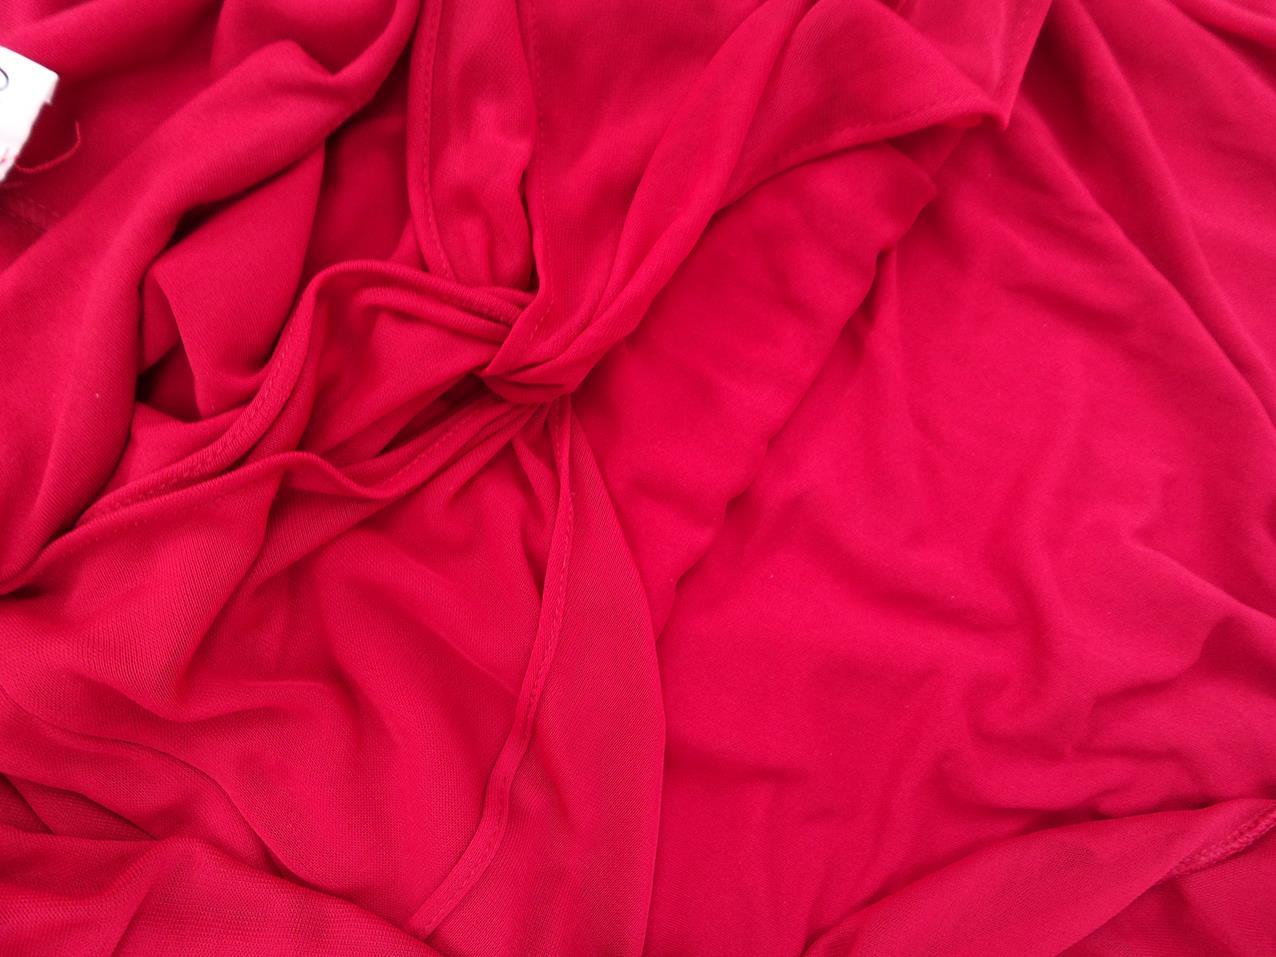 a3f38acca7fd Orna Farho storlek unika bollen lång röd klänning | RomanticFashion.se